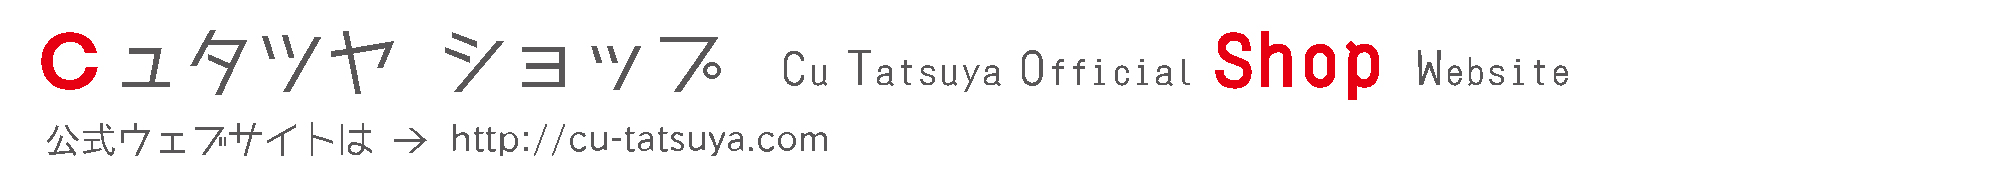 Cュタツヤ  Cu Tatsuya Official Shop Website